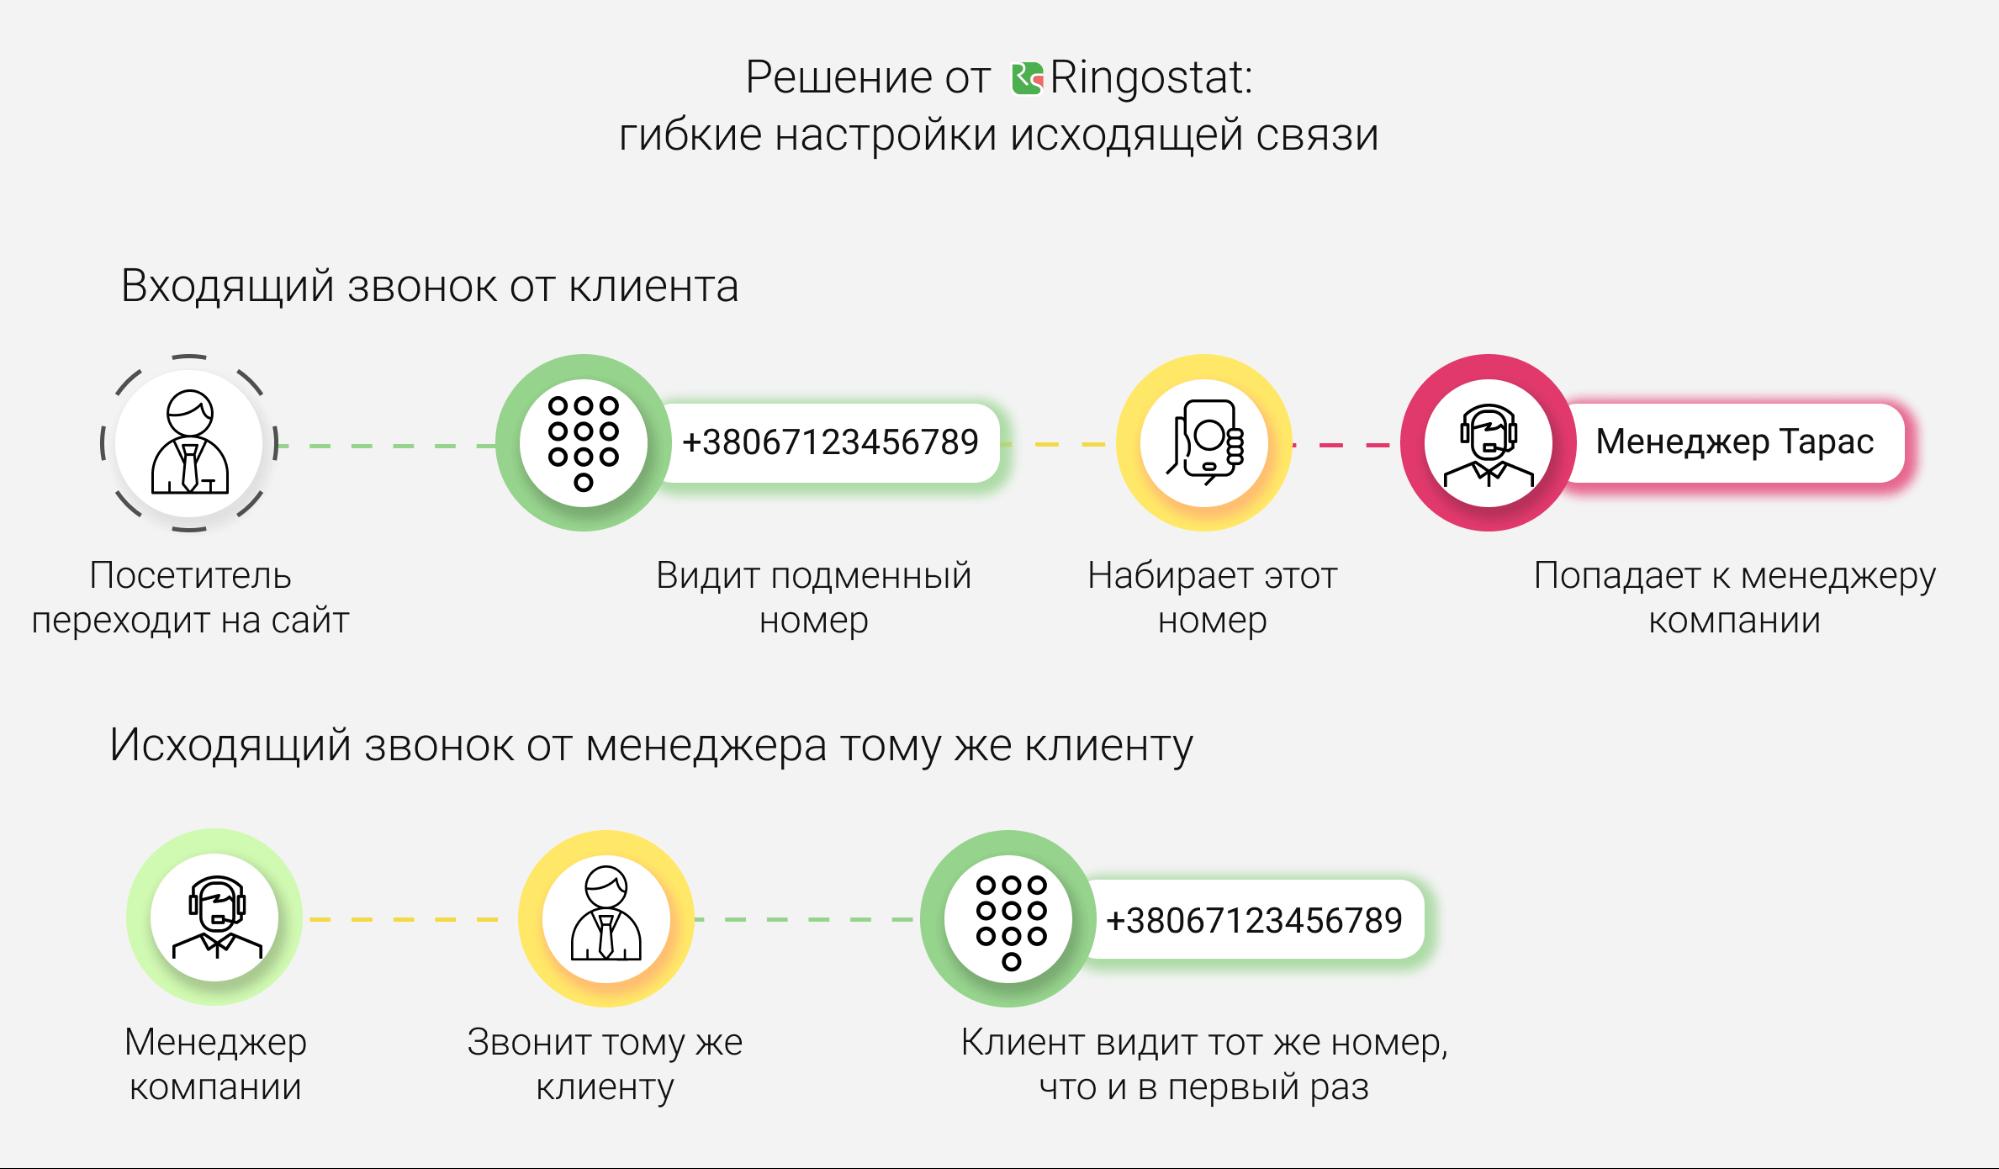 Виртуальная АТС — гибкие настройки исходящей связи Ringostat